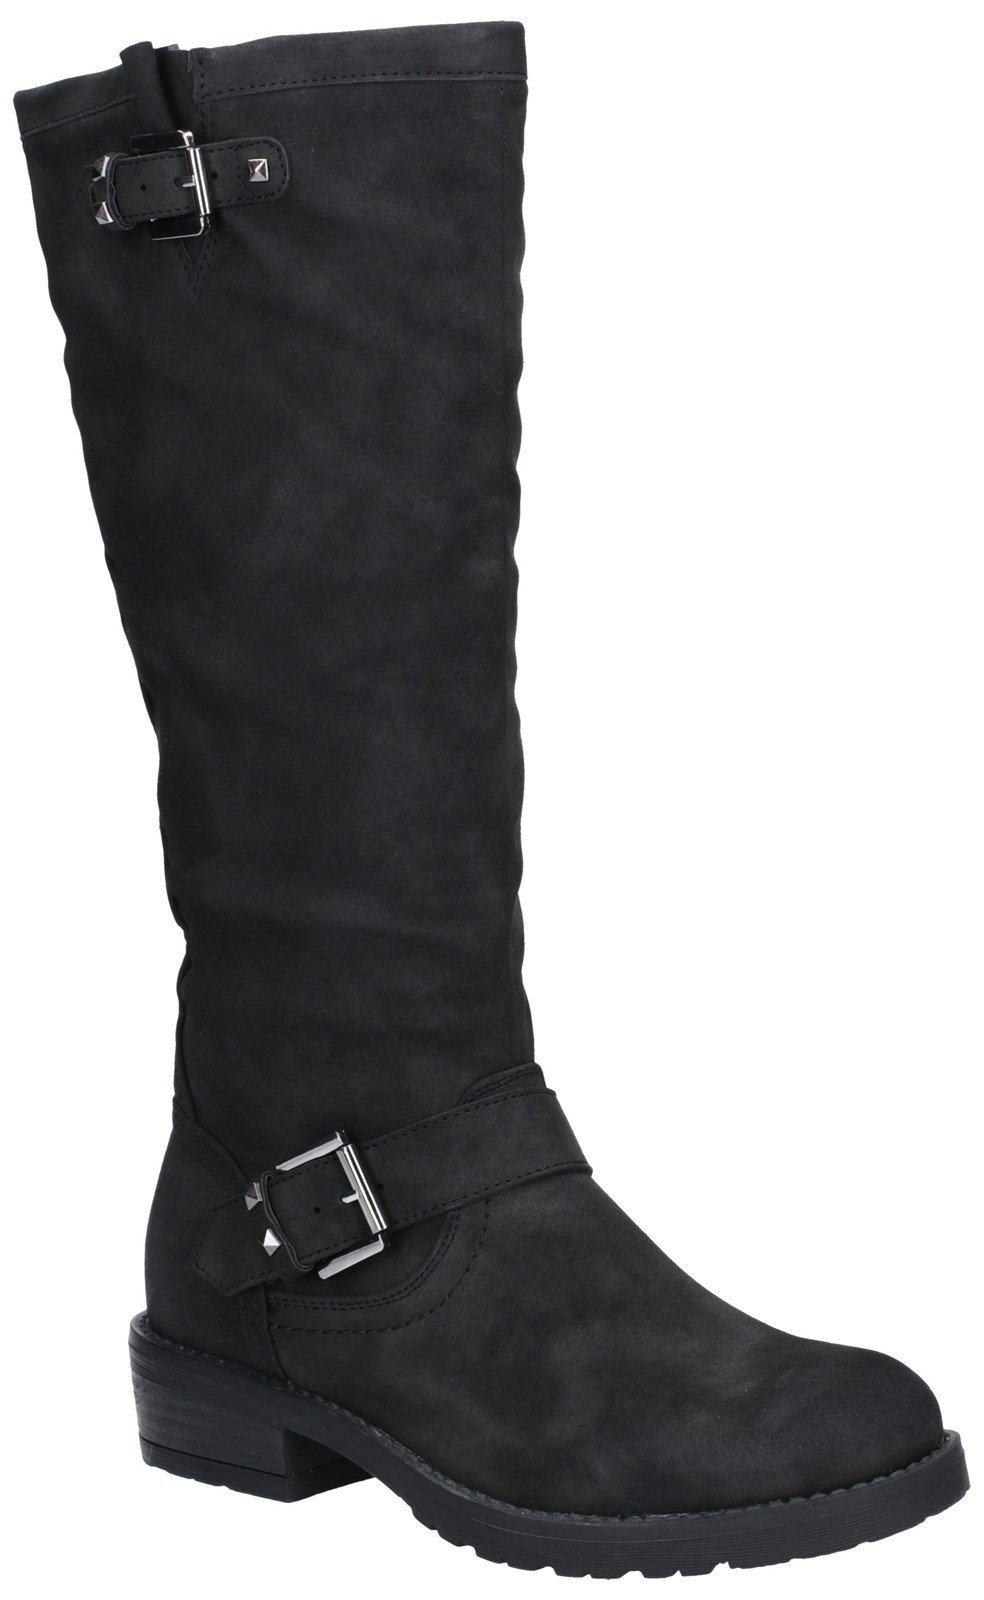 Divaz Women's Courtney Zip Up Boot Black 27167-45653 - Black 3